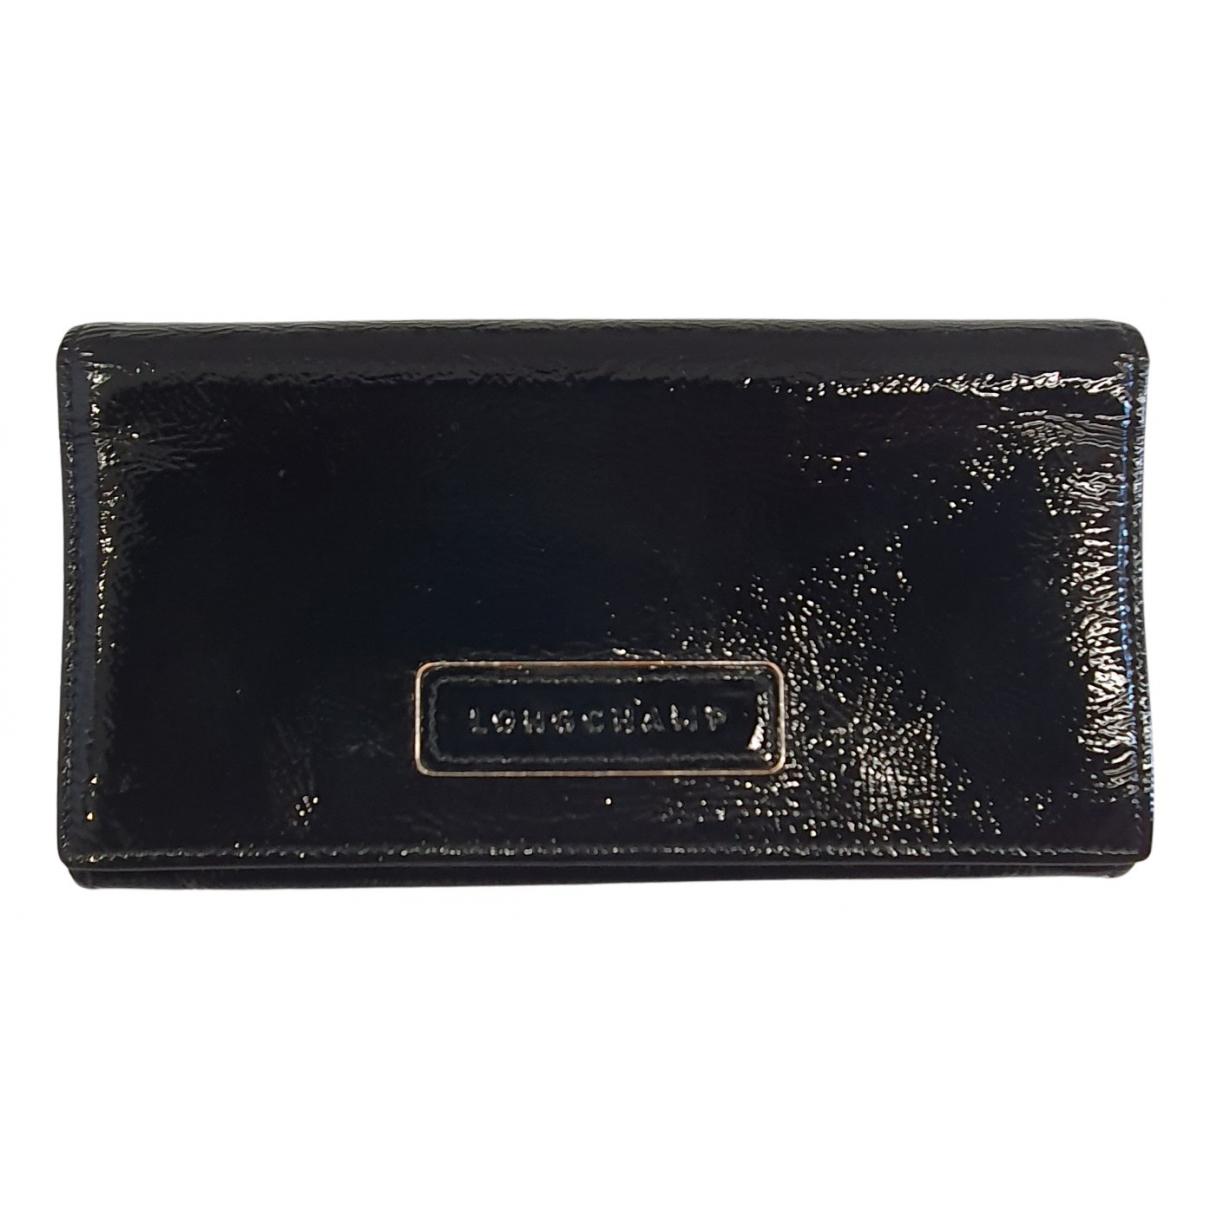 Longchamp N Black Patent leather Purses, wallet & cases for Women N